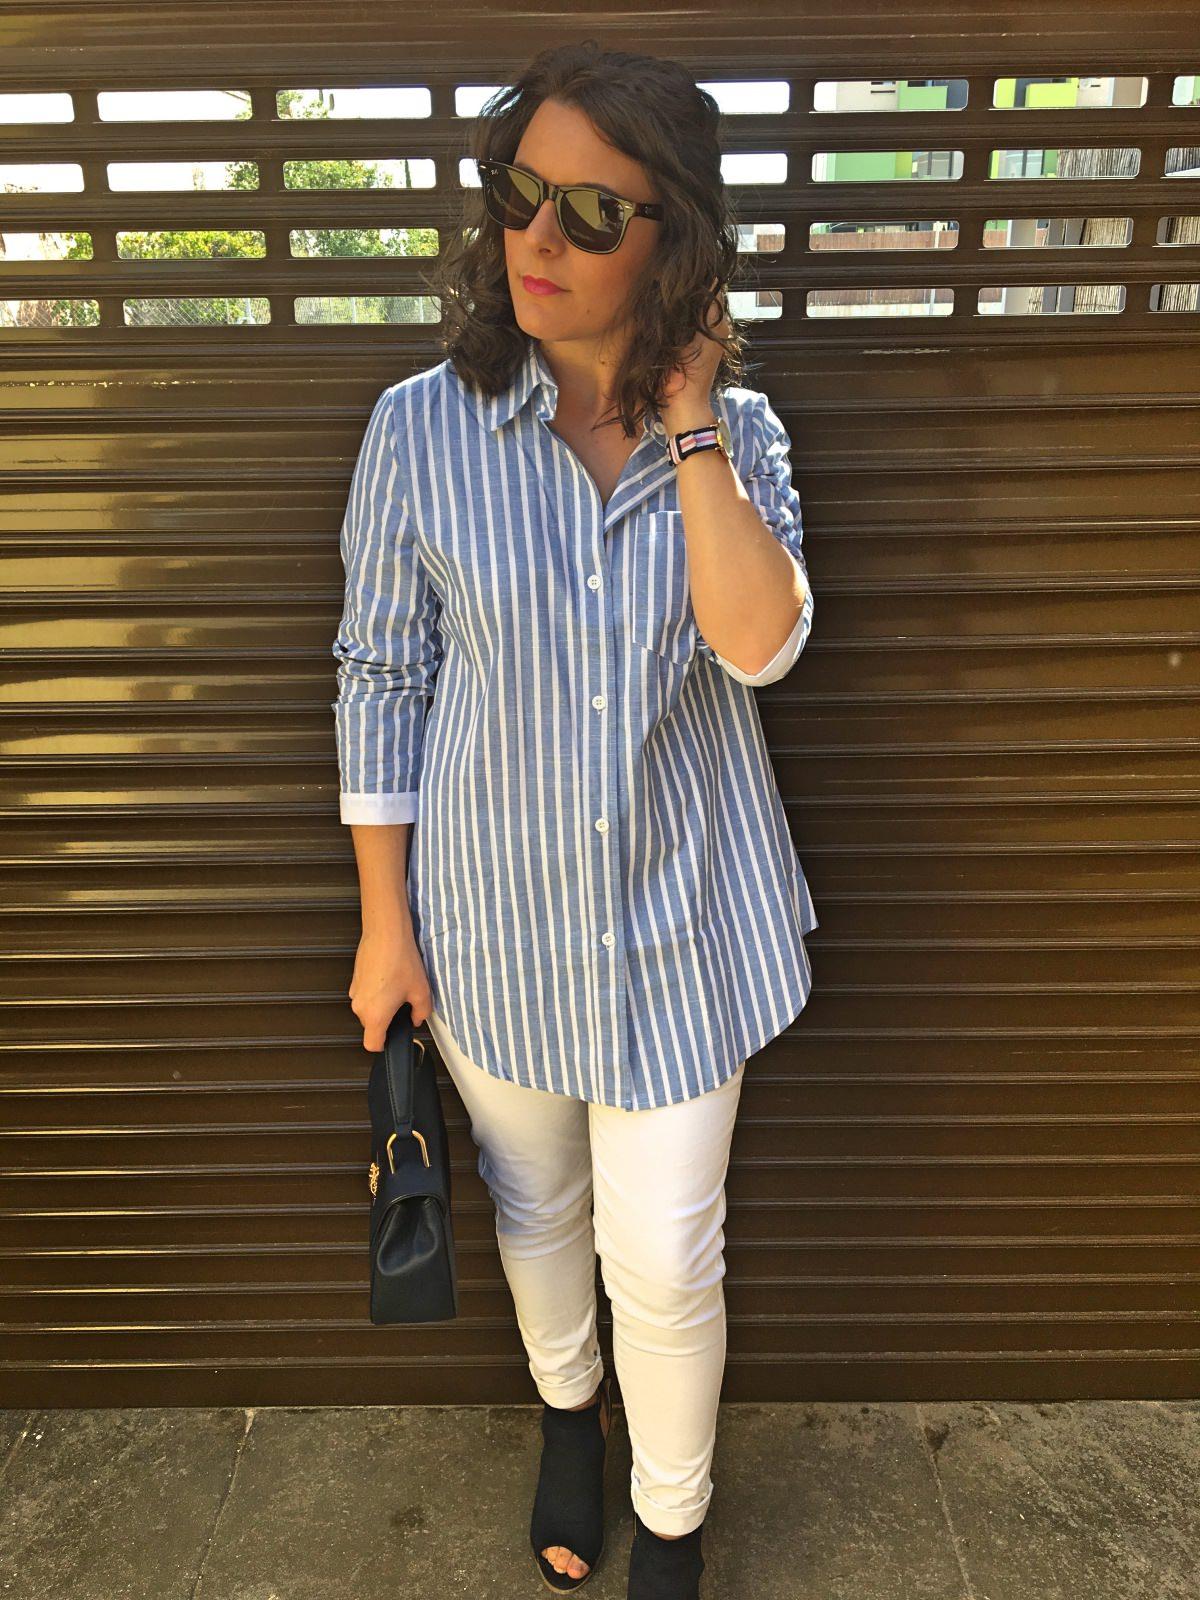 look_blusaderayas_fashionblogger_mivestidoazul-com_influencer_blogdemoda_castellonmg_1879